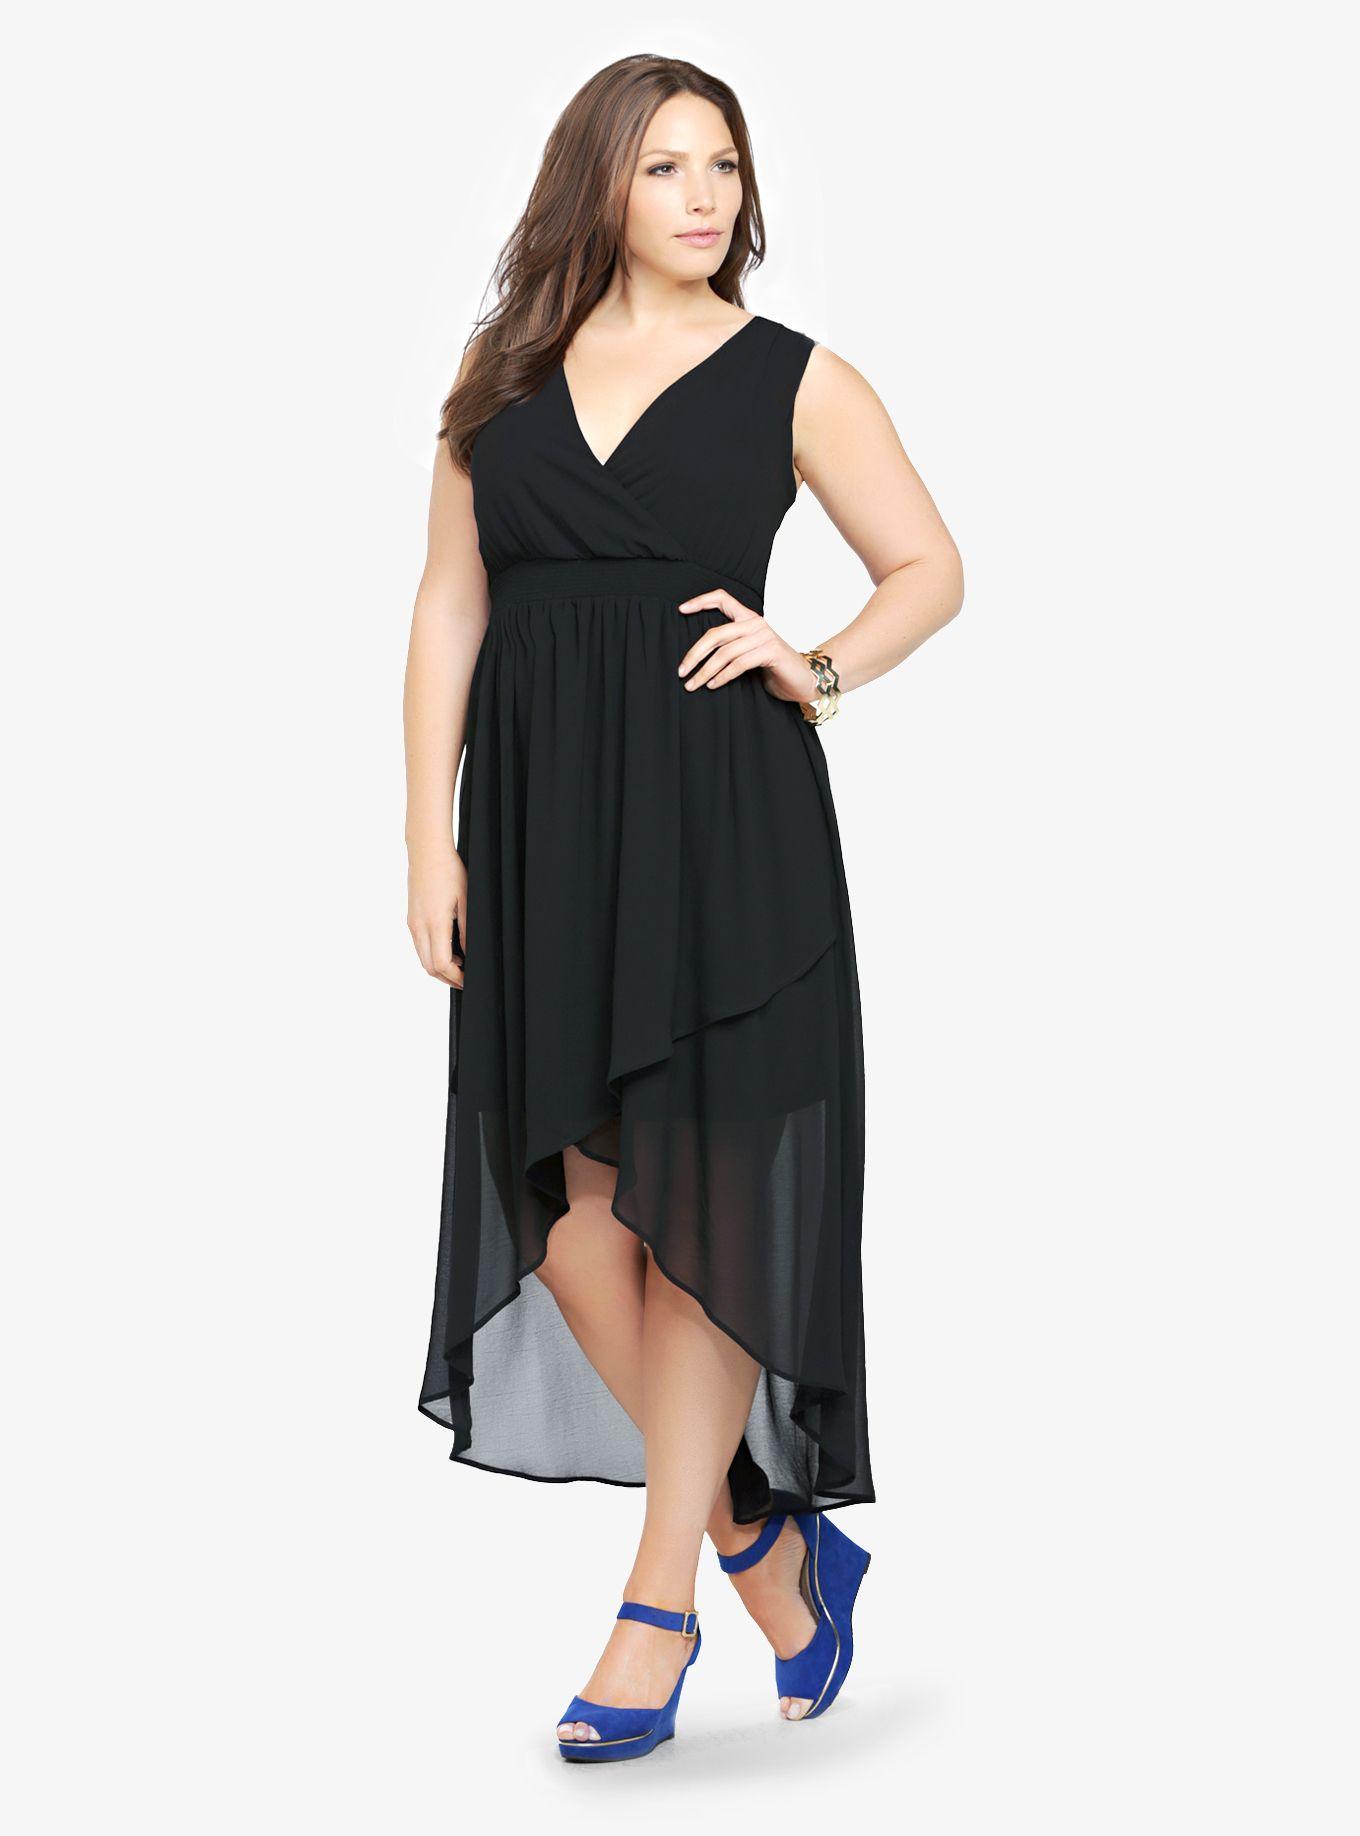 m s plus size dresses torrid